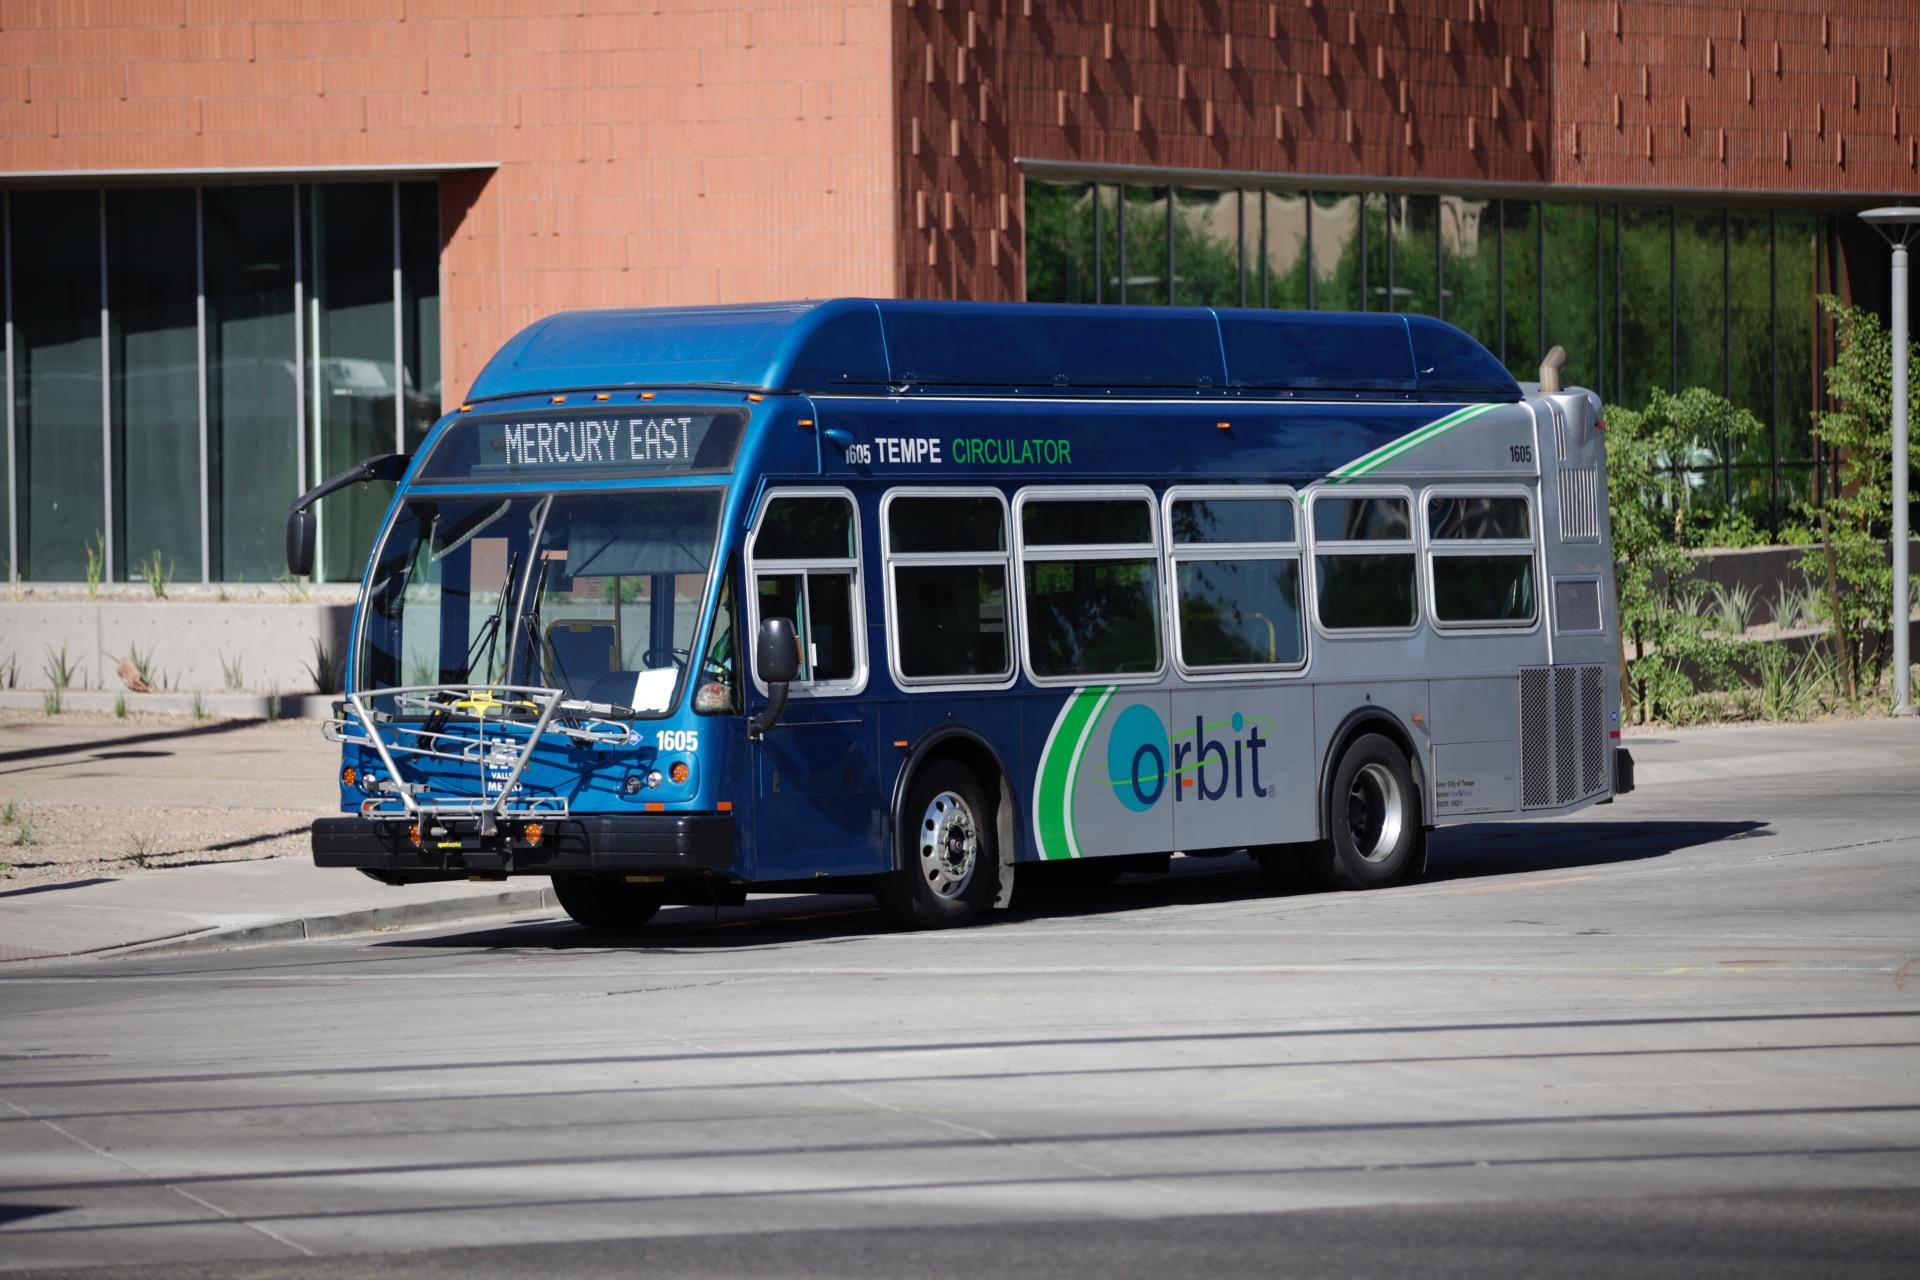 Orbit Free Neighborhood Circulator Shuttle | City of Tempe, AZ